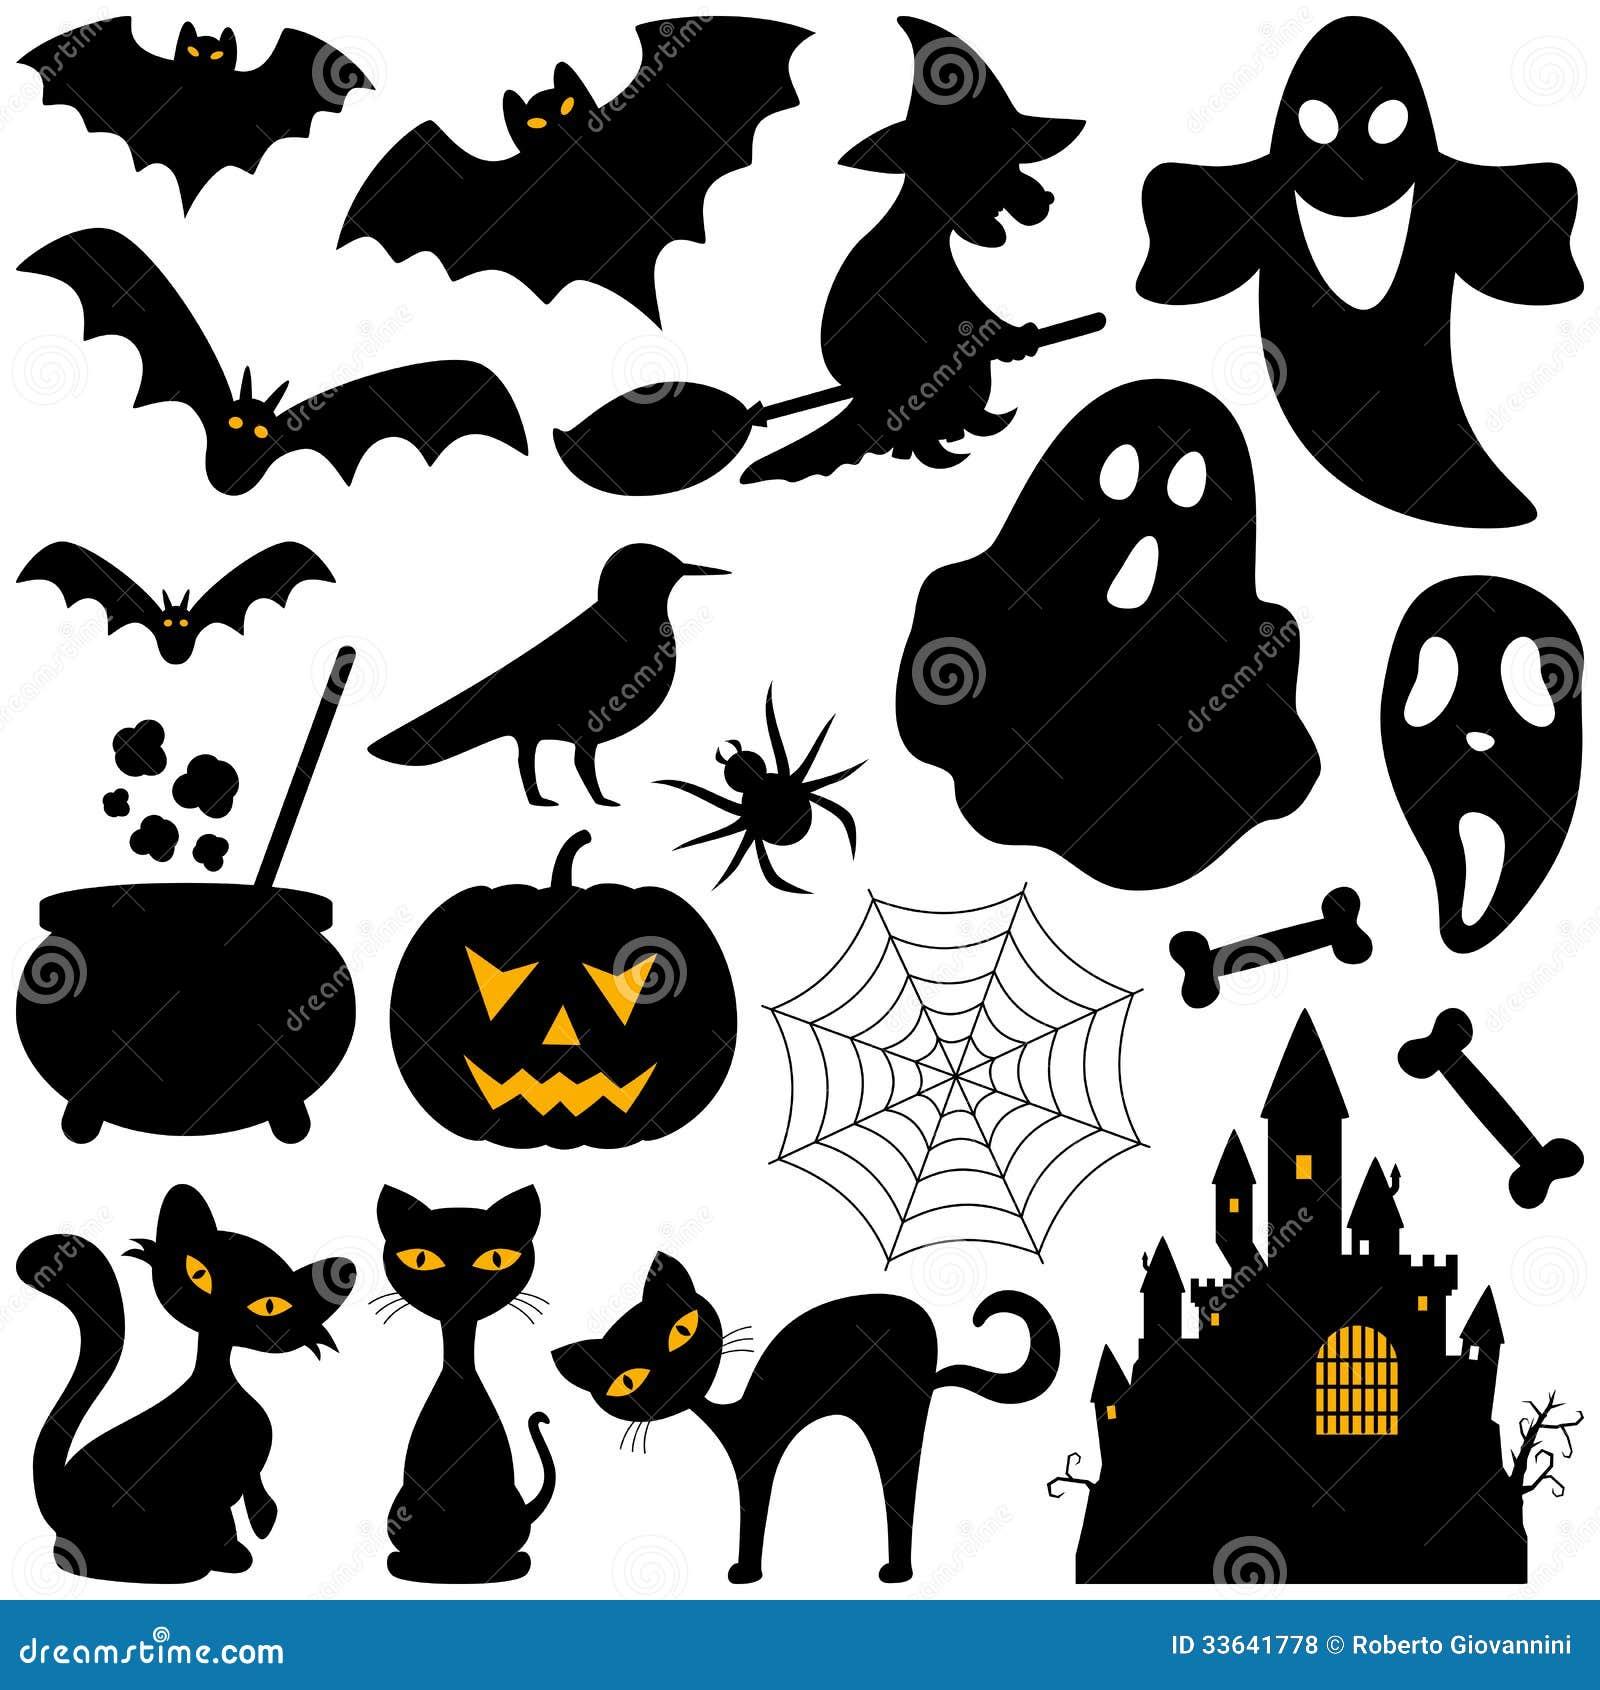 halloween silhouette des  u00e9l u00e9ments illustration de vecteur black cat clip art cartoon black cat clip art black and white